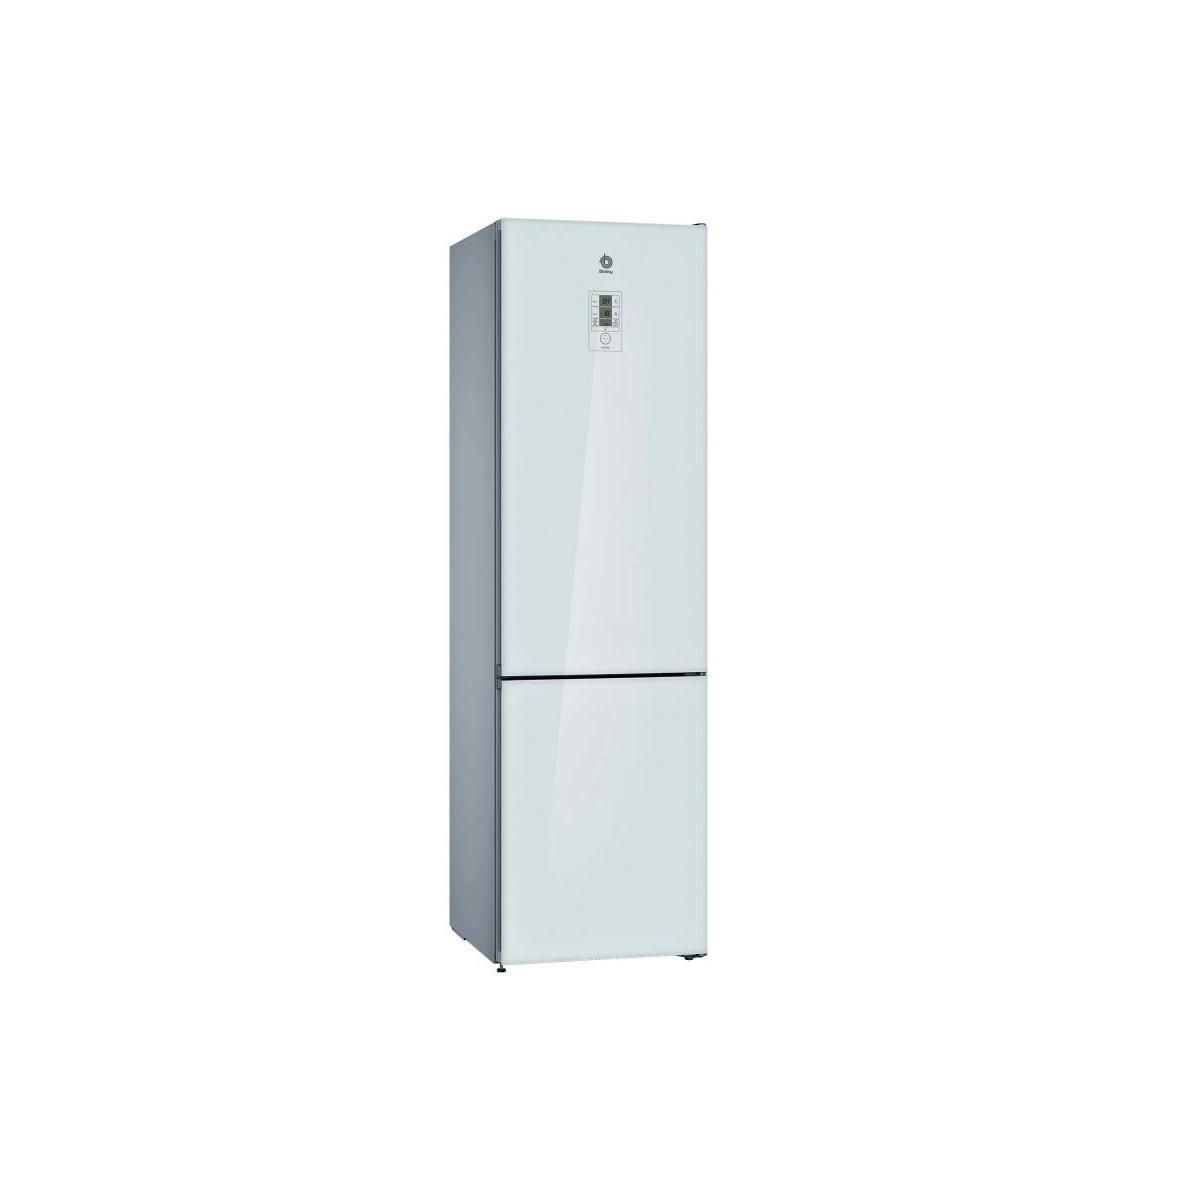 Combi Balay 3KFE768WI blanco 203 x 60 cm A++